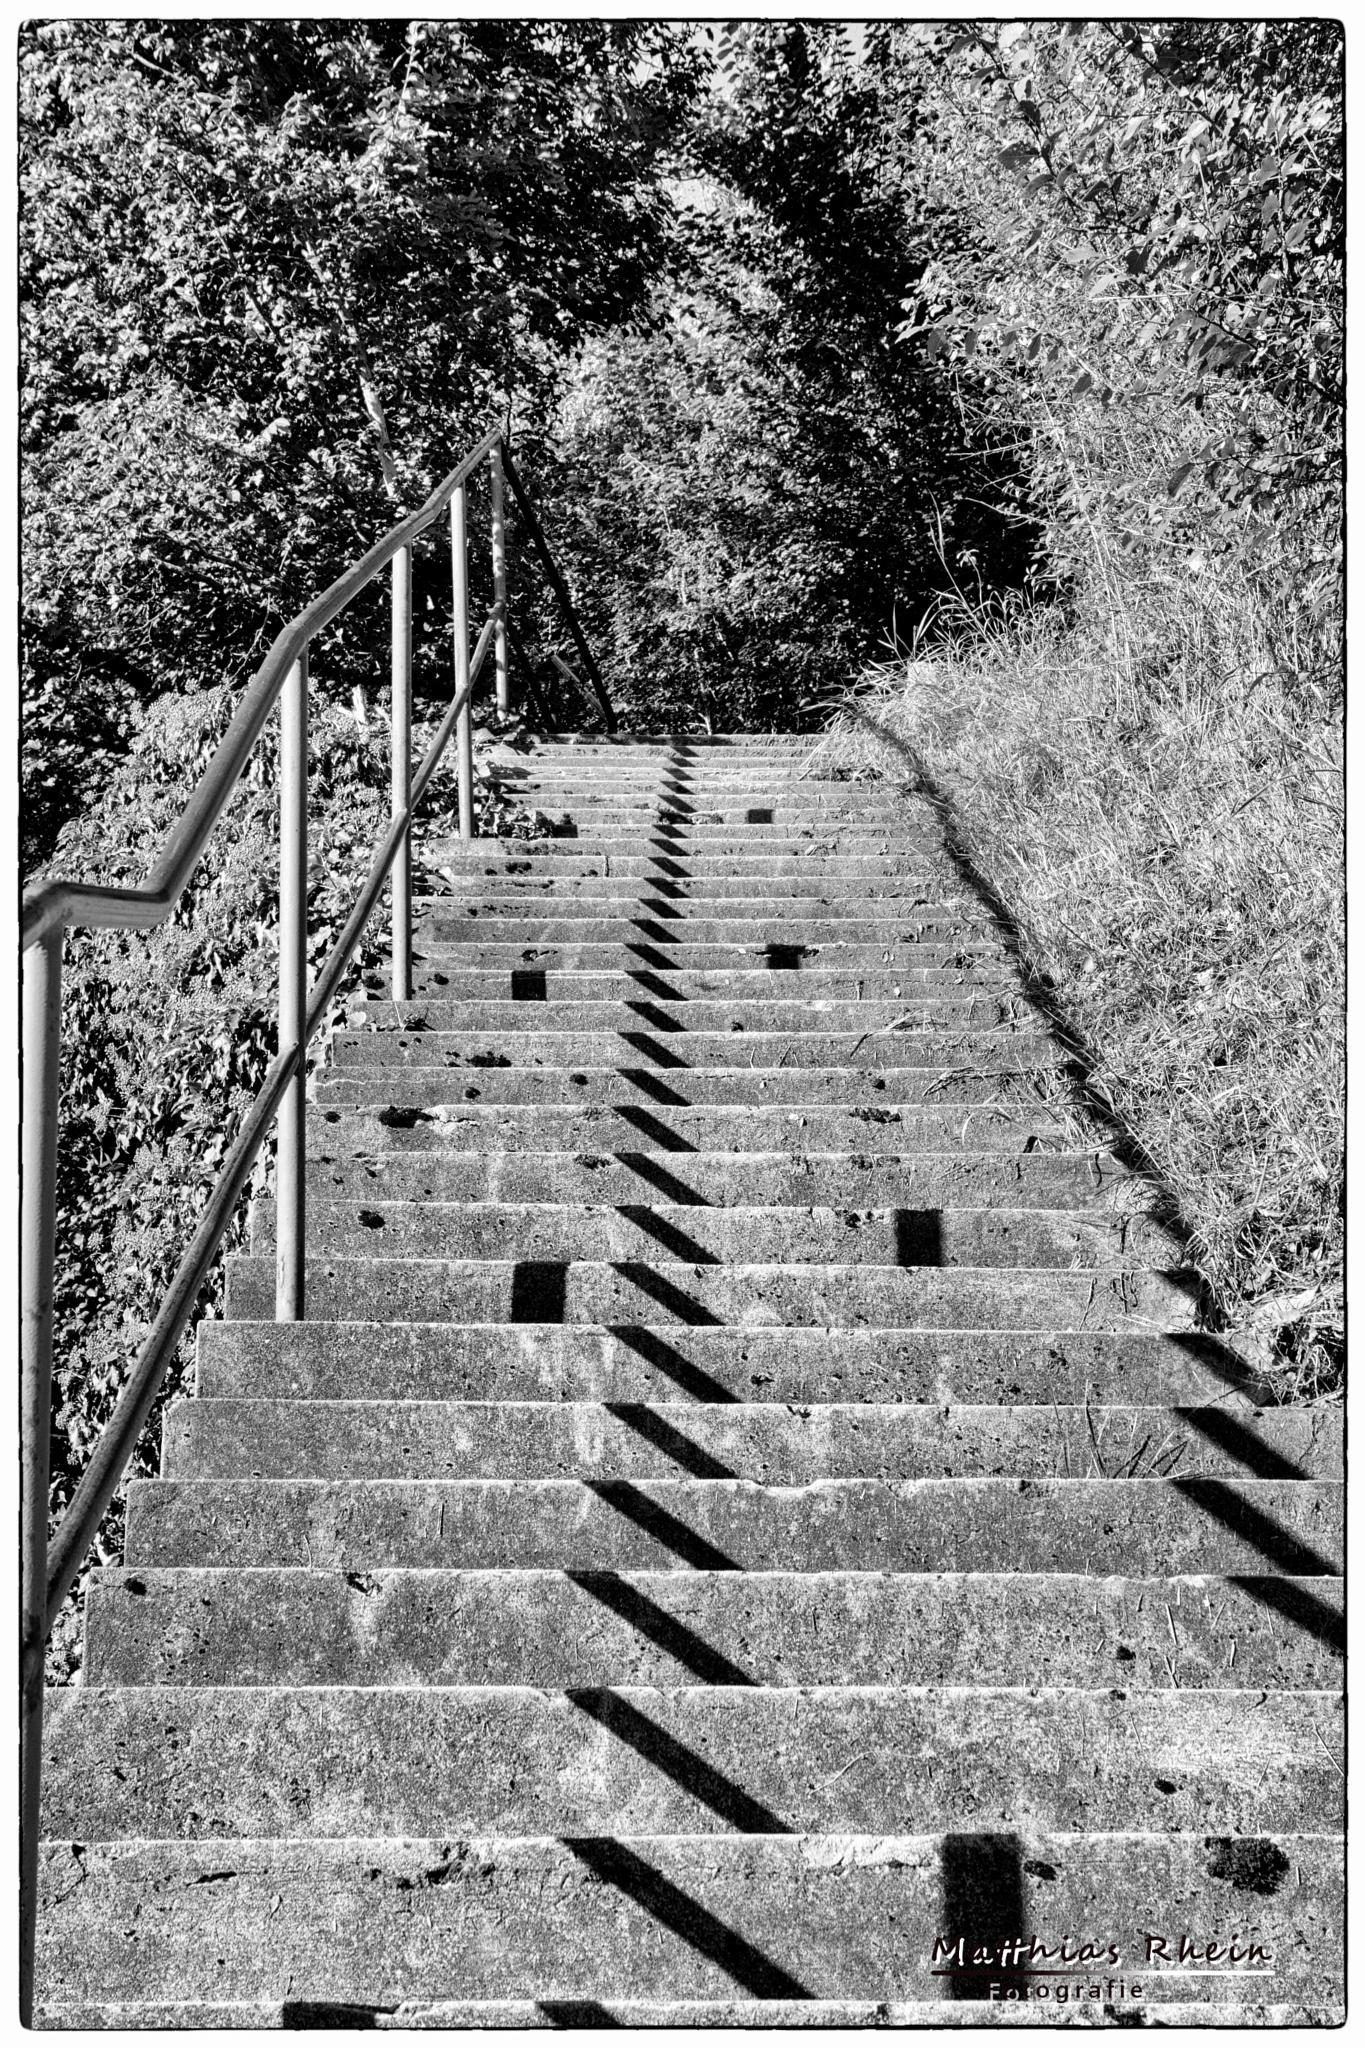 Follow the Line #3 by MatthiasRhein